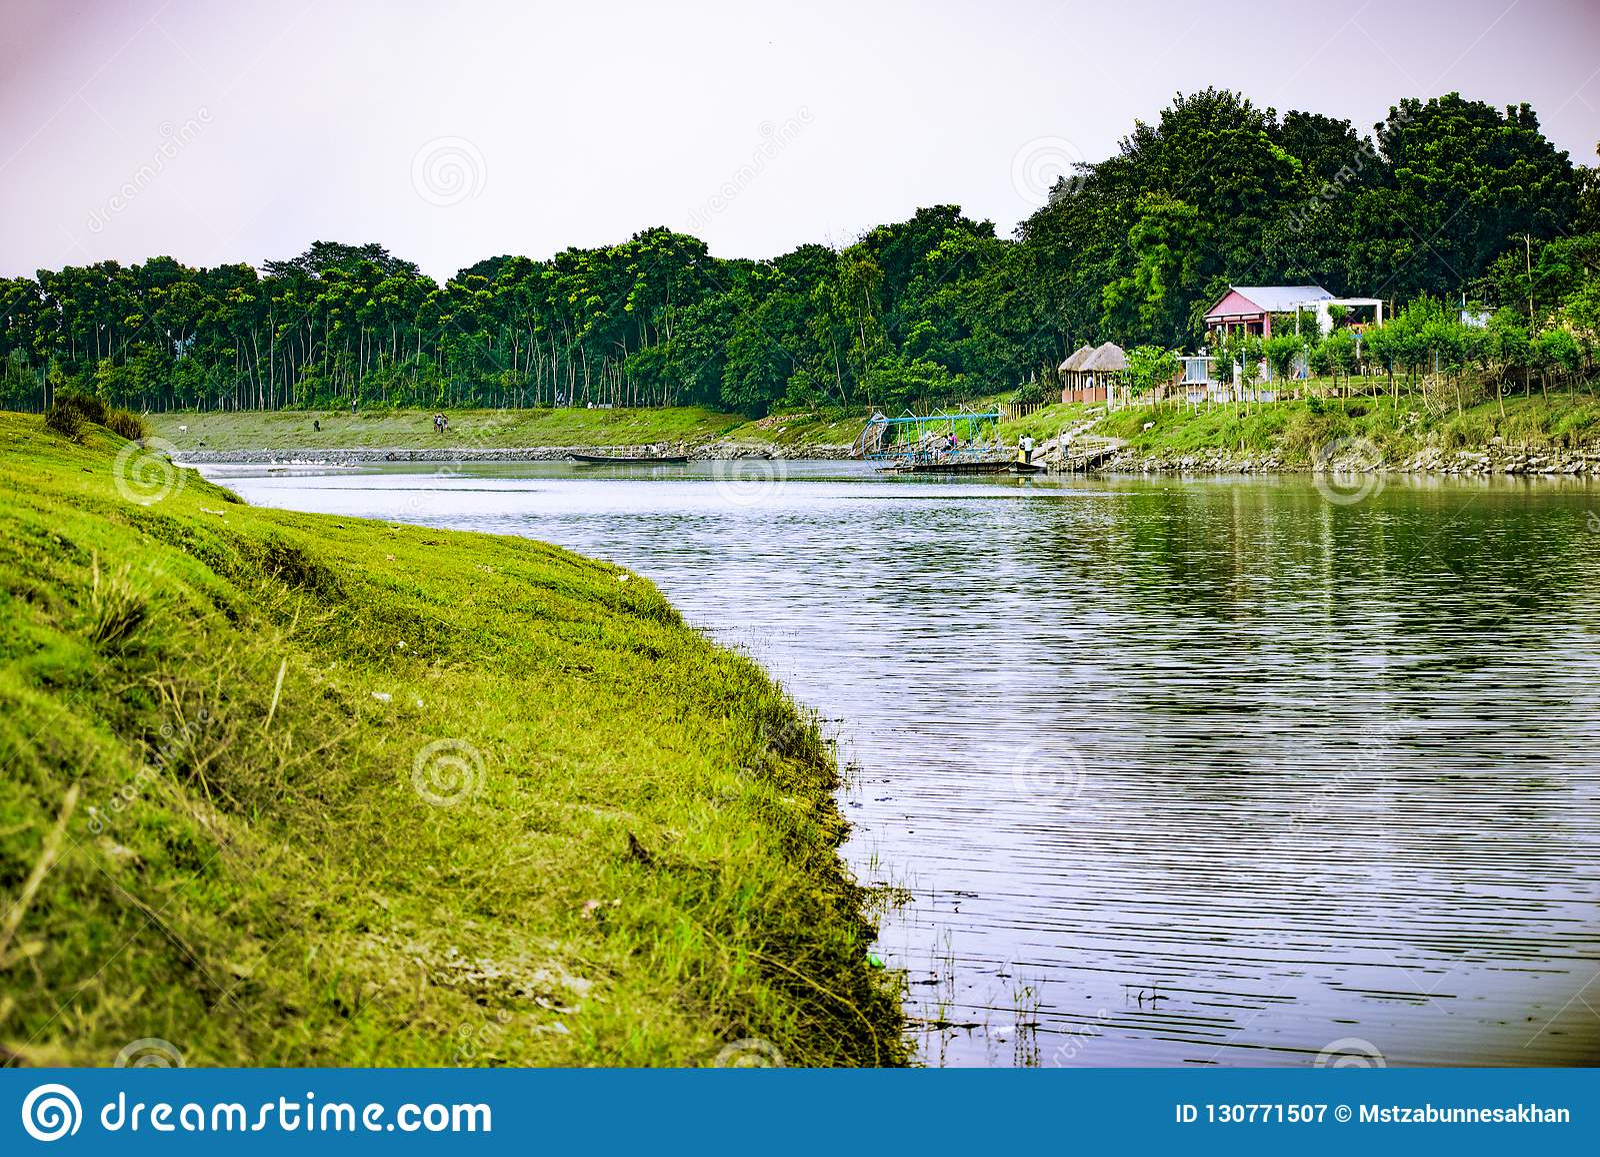 Punorvoba河,迪纳杰布尔,RÄ  jshÄ 喂,孟加拉国